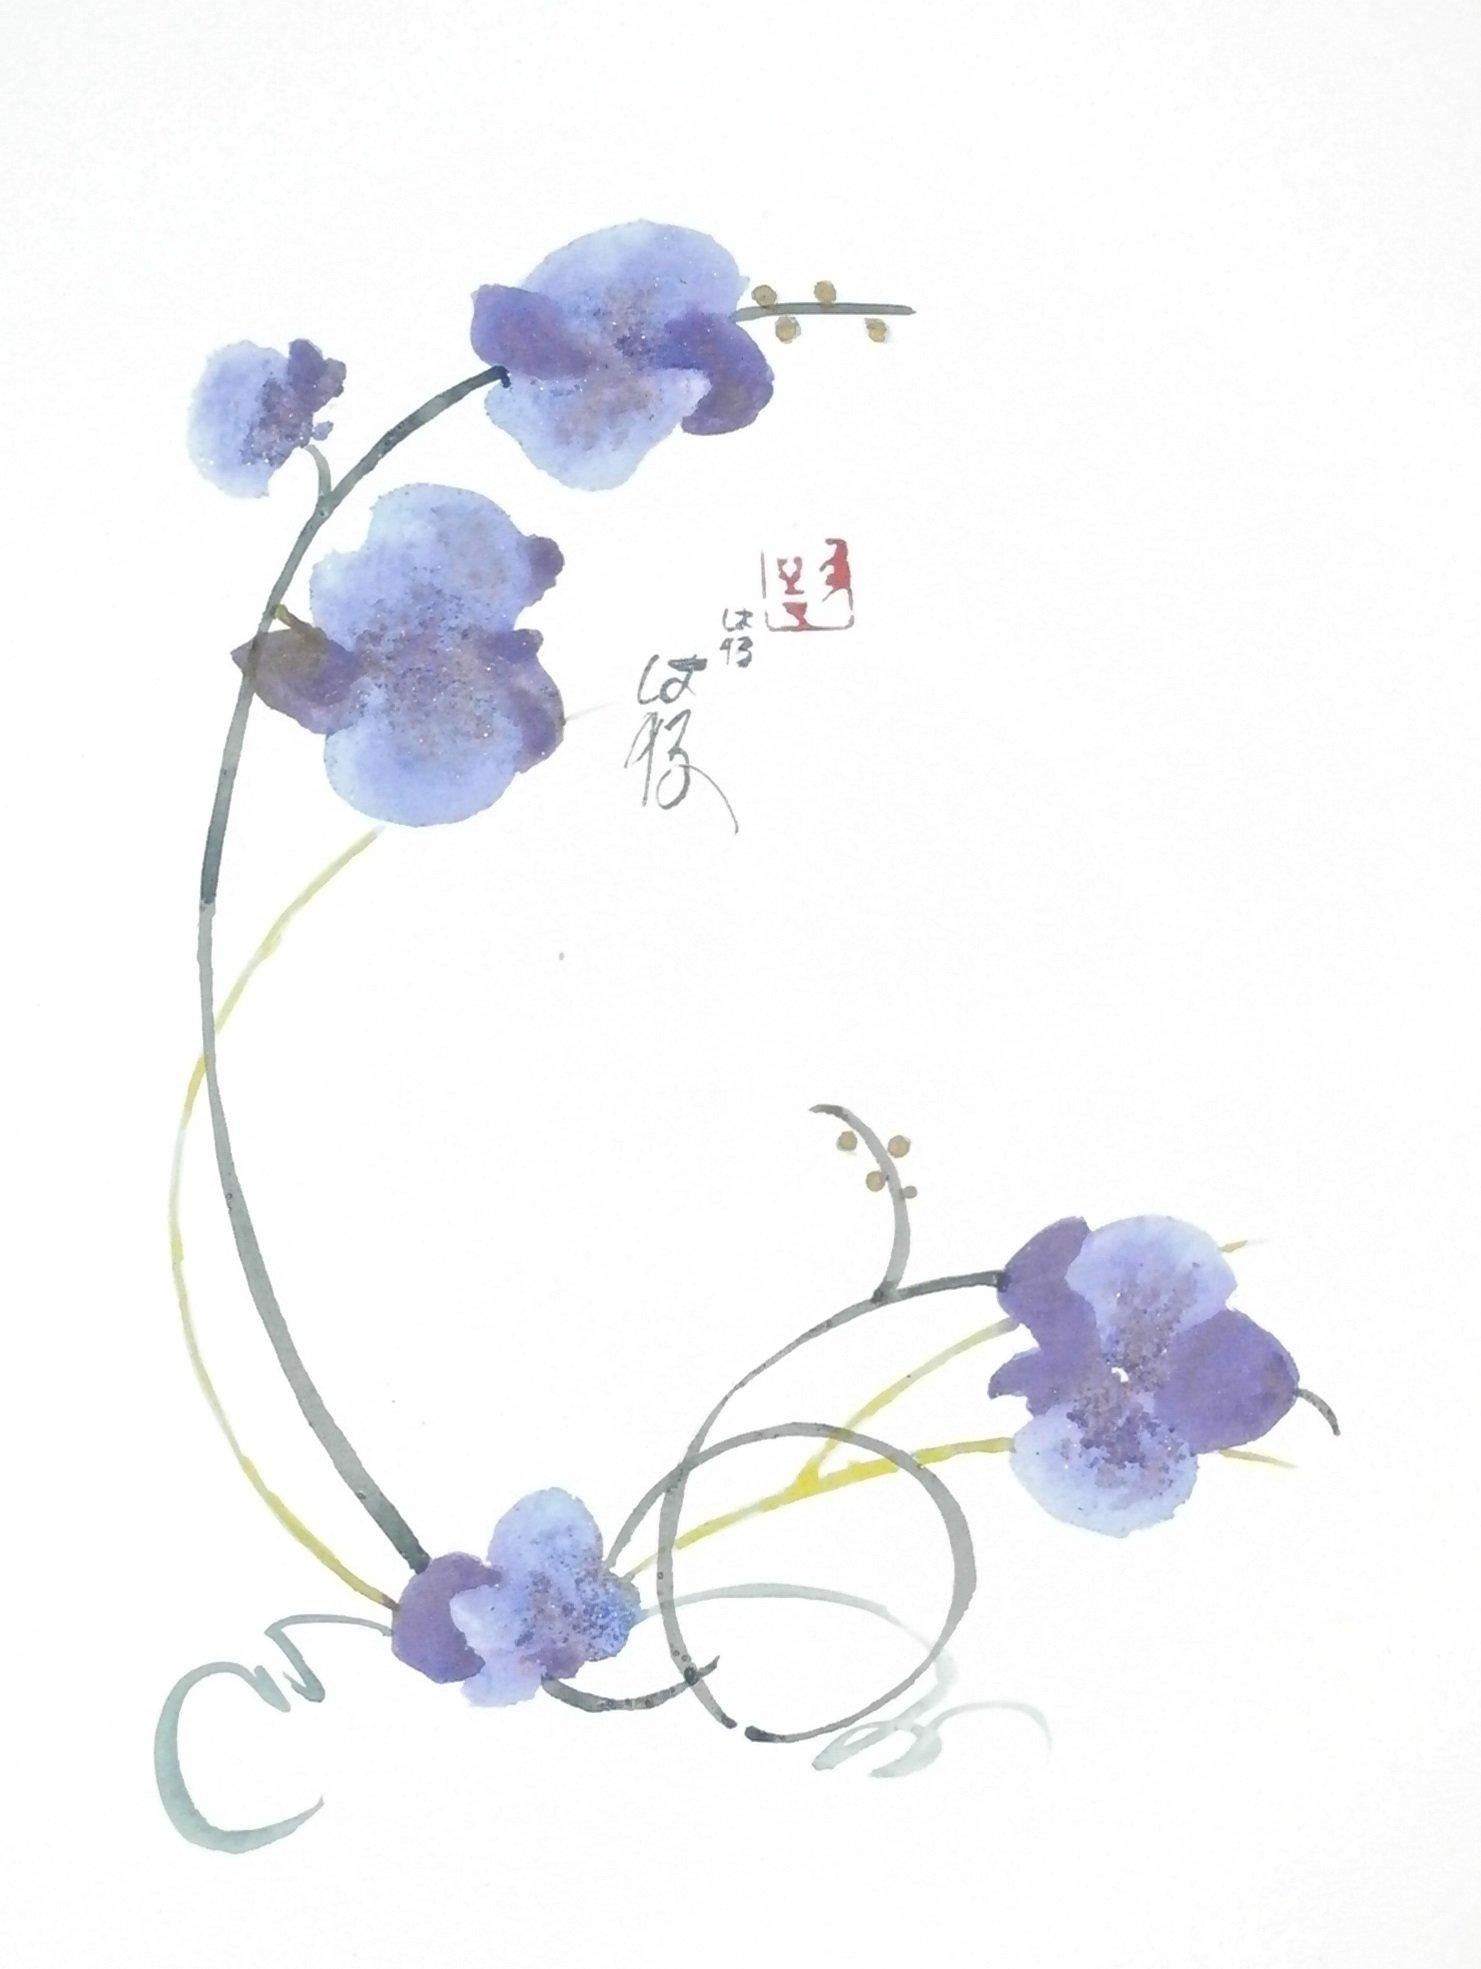 C novel dessins fleurs et arbres - Dessin d orchidee ...